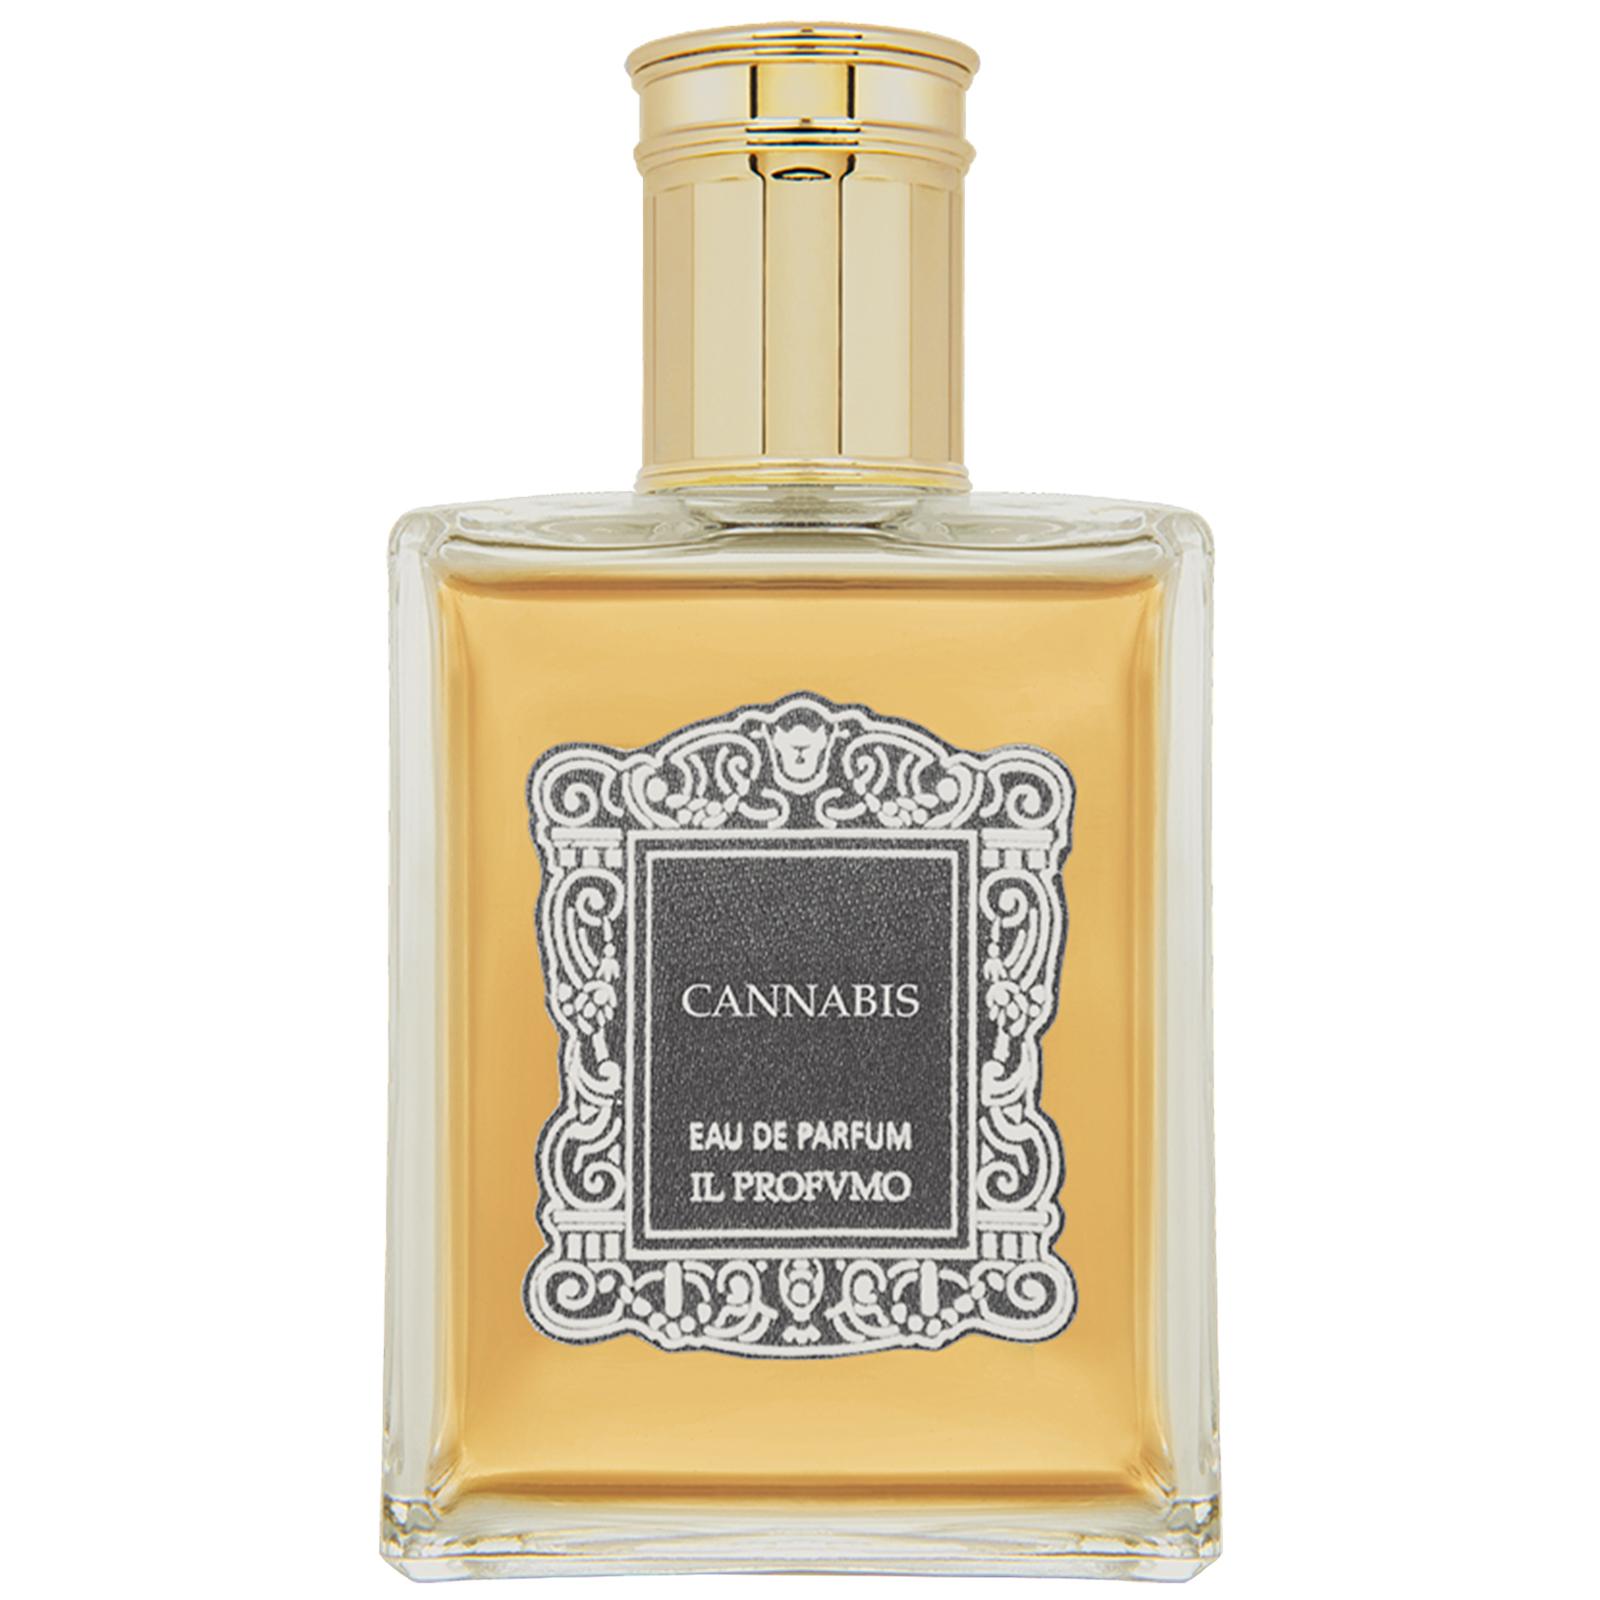 Cannabis profumo eau de parfum 100 ml